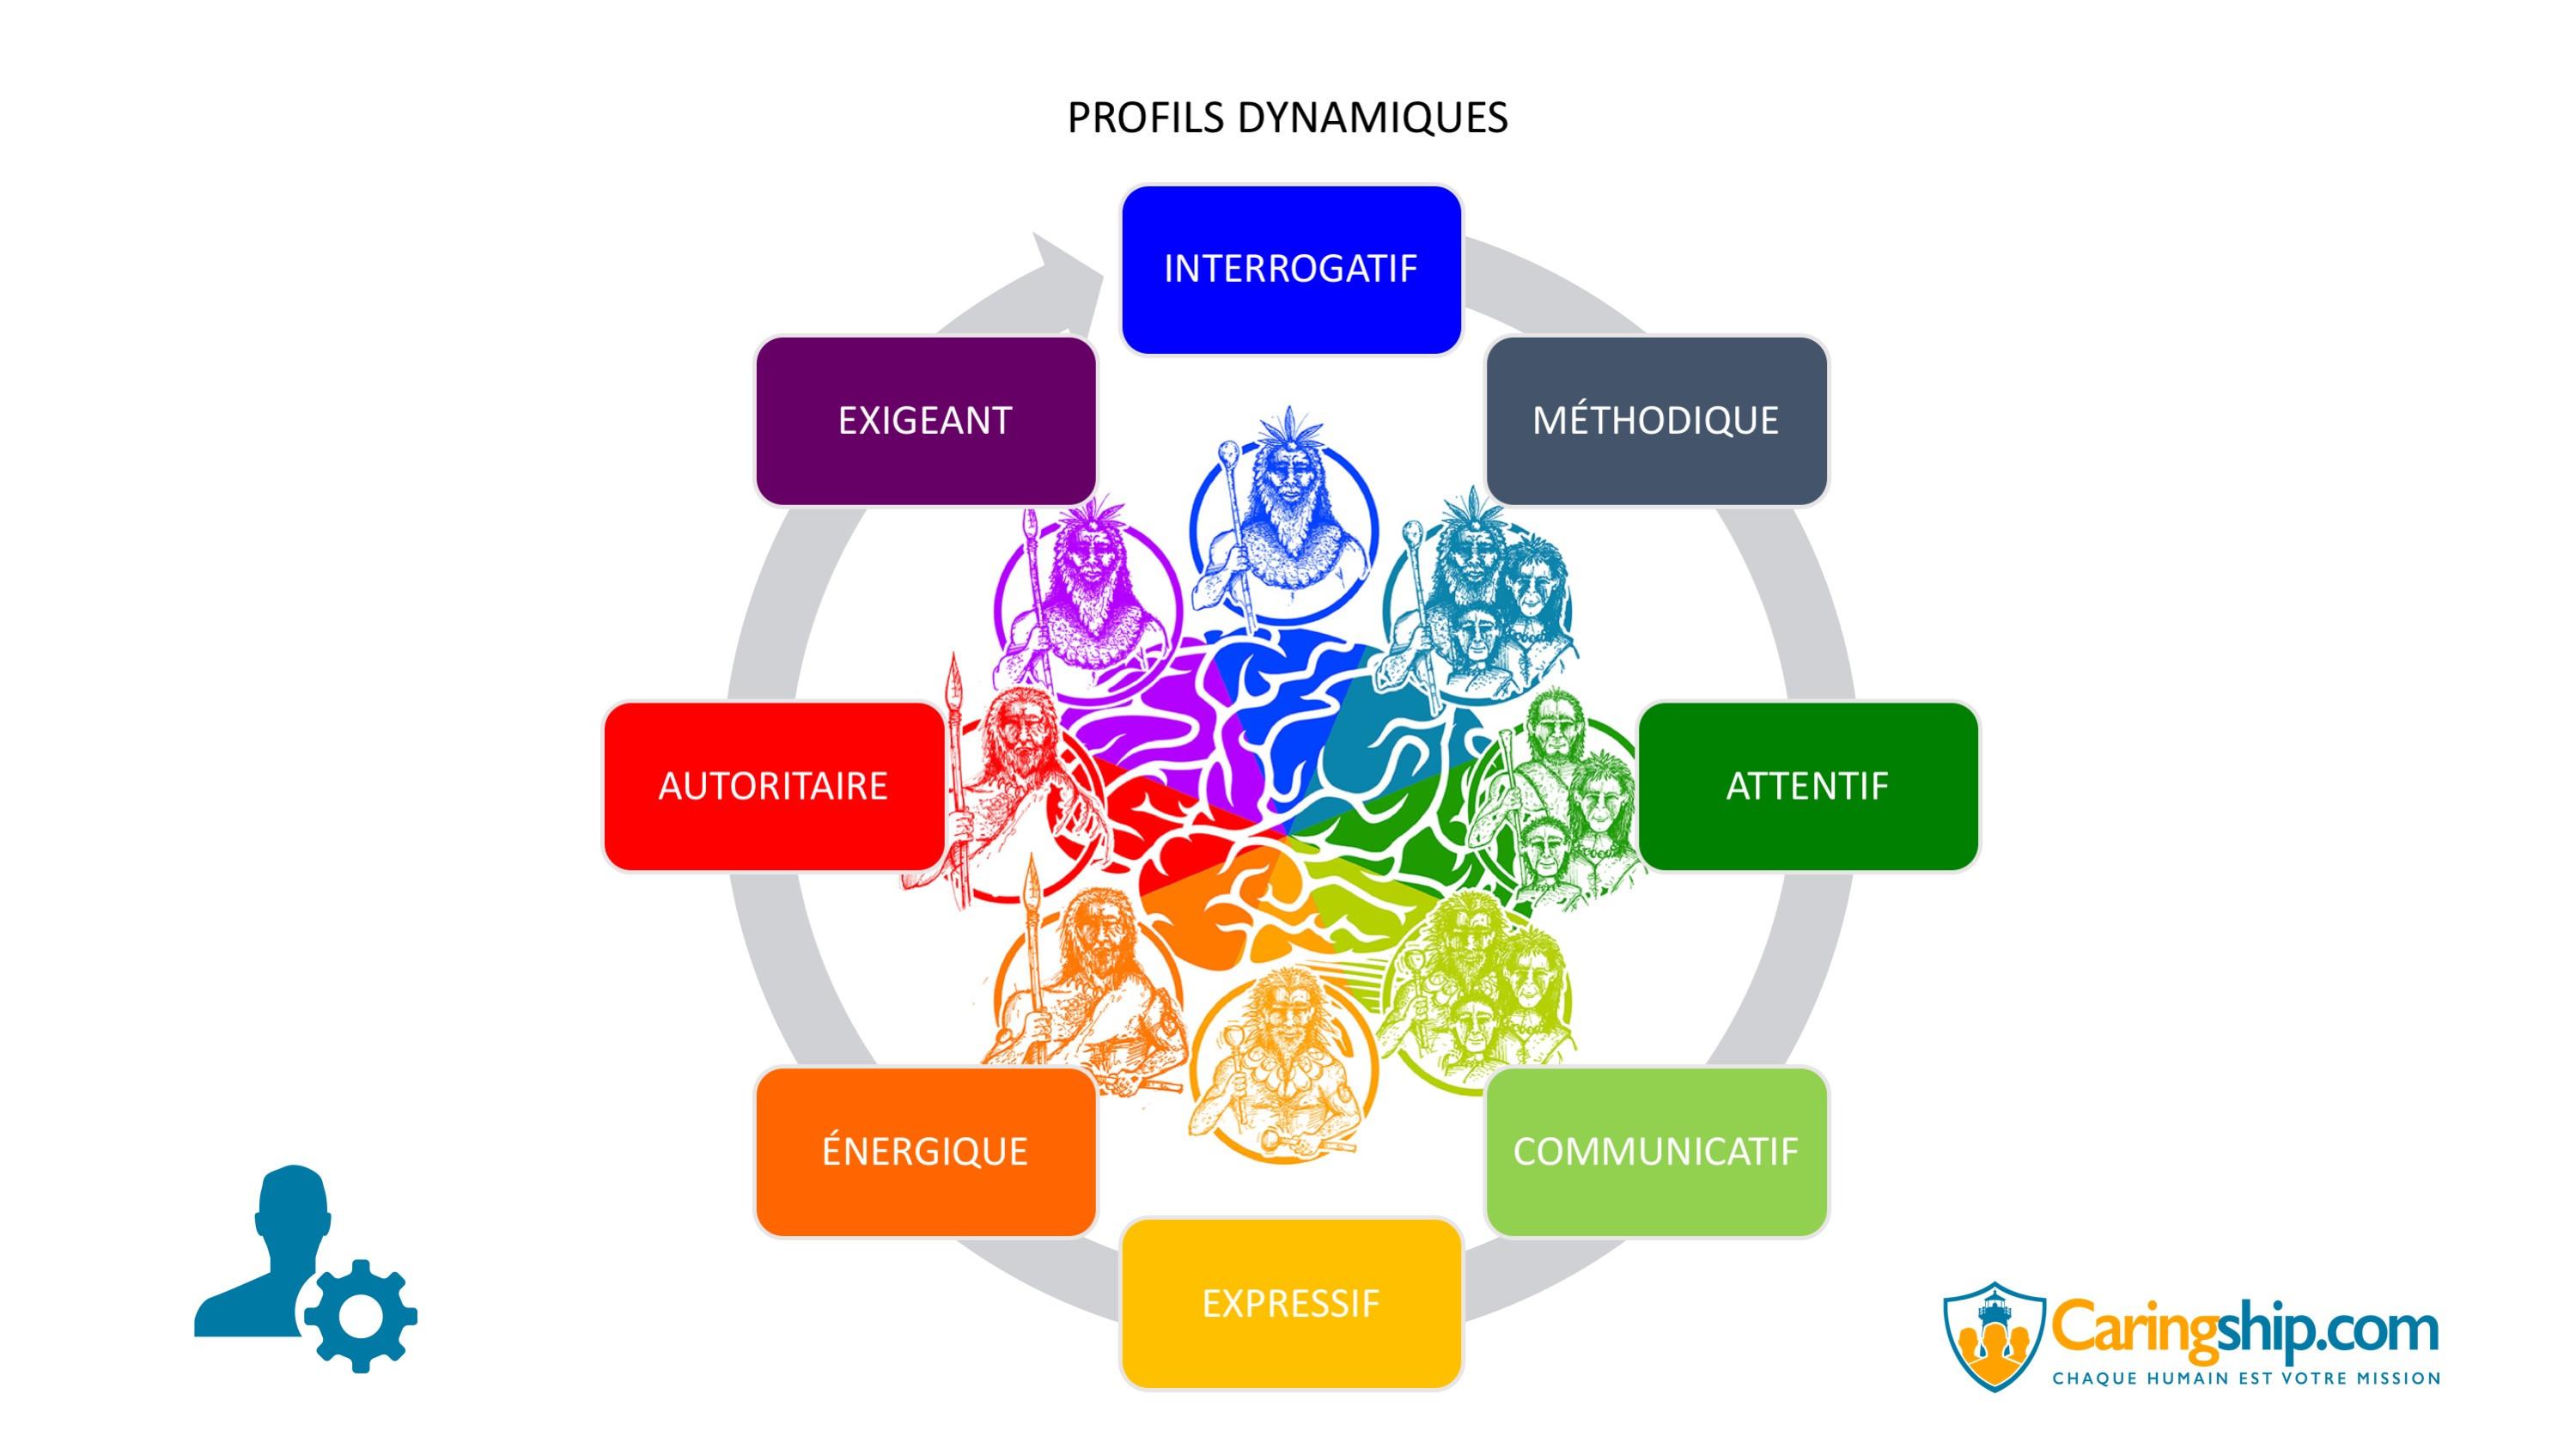 Profils dynamiques Caringship©